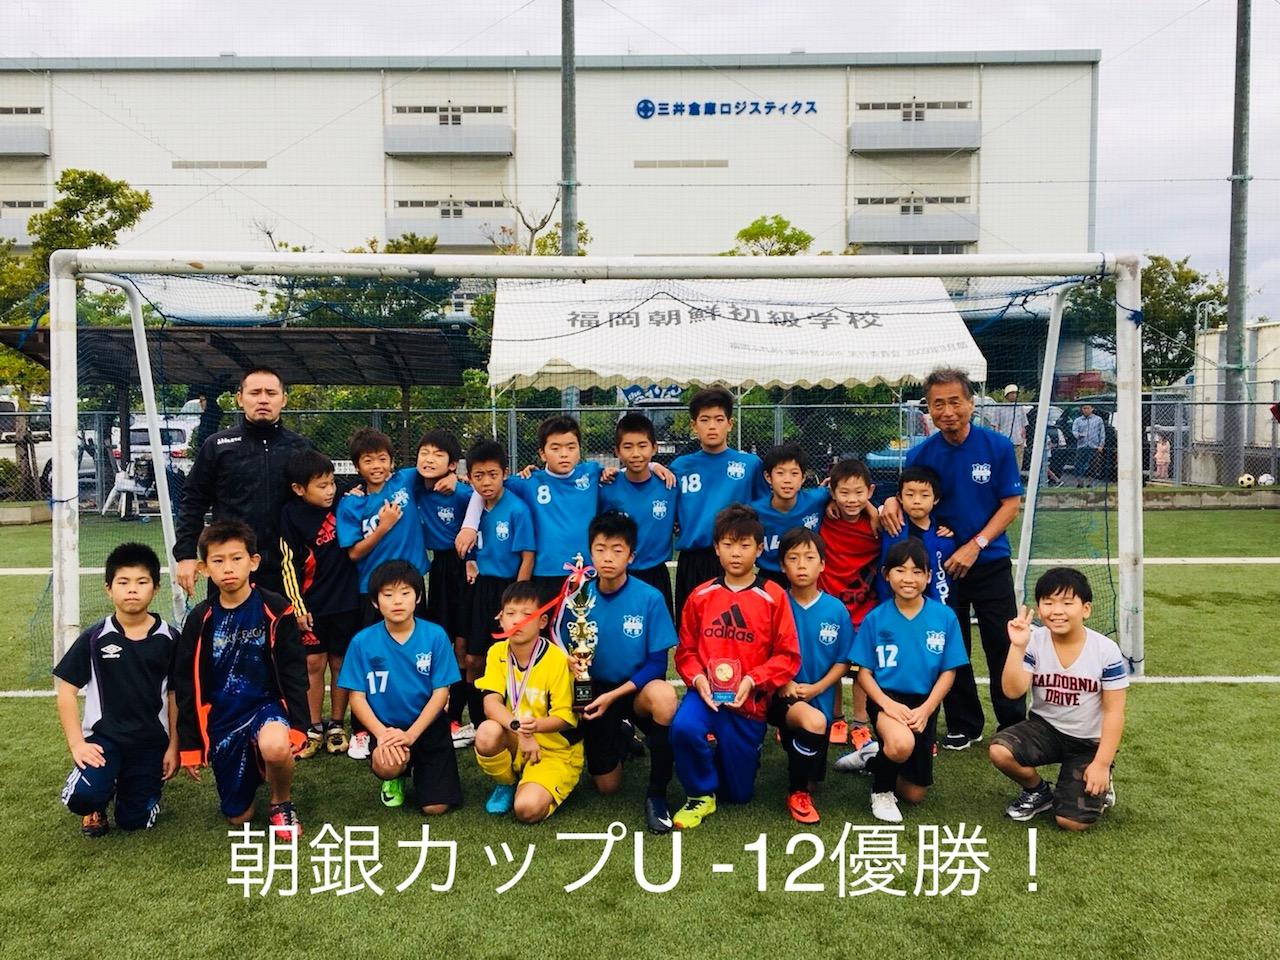 U-12朝銀カップ優勝 2018/9/29